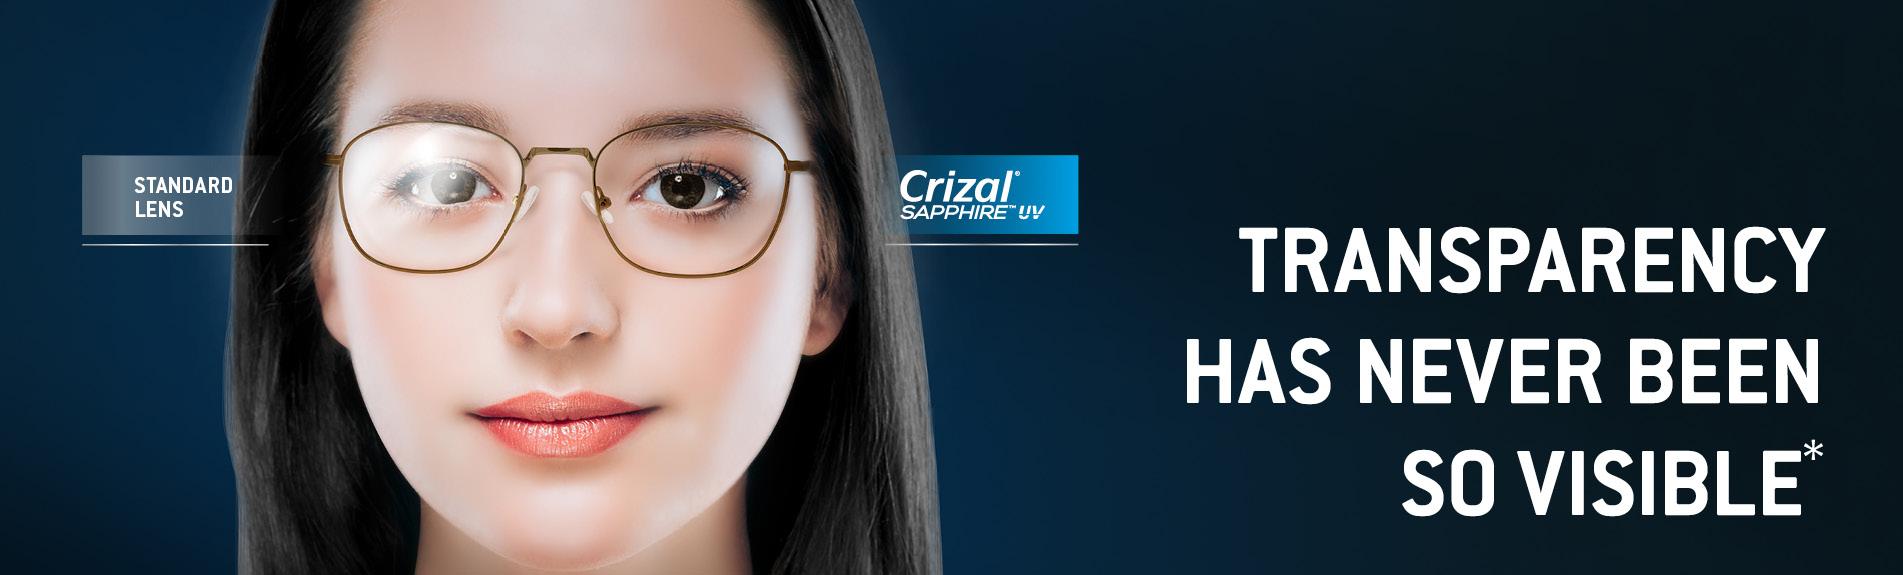 62c7e933b17 Crizal sapphire uv lenses best in class transparency essilor qatar jpg  1903x575 Who carries crizal lenses